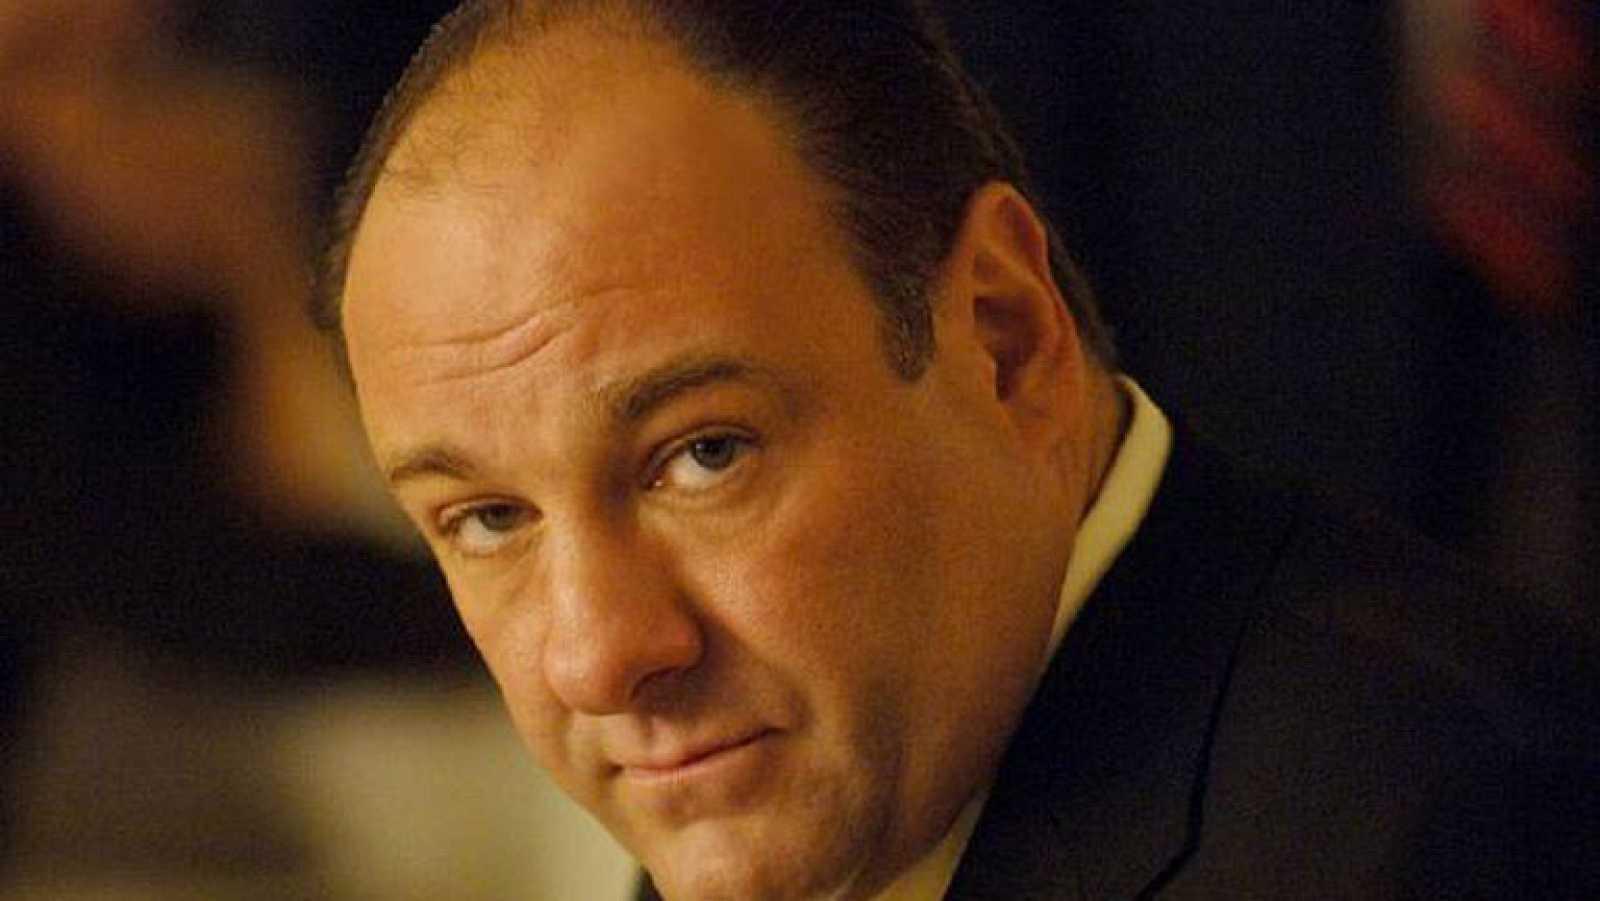 Muere el actor James Gandolfini